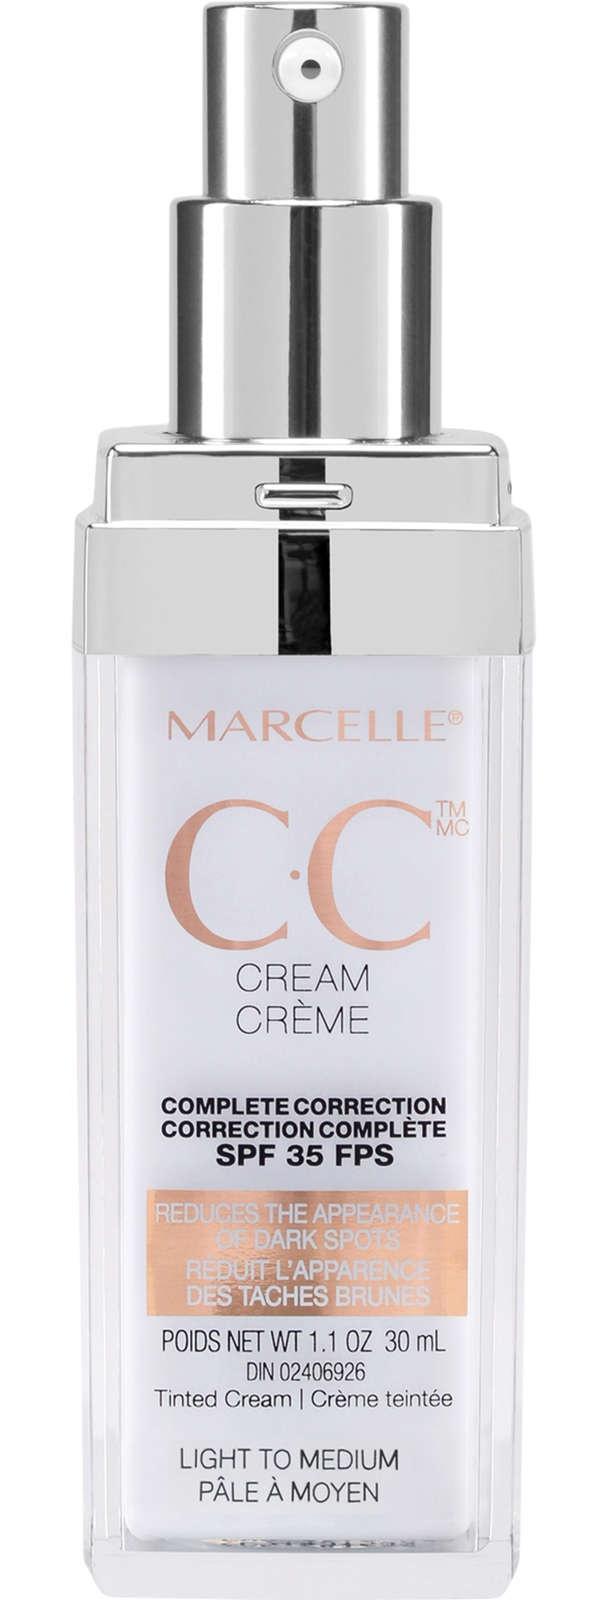 Marcelle Cc Cream Spf 35